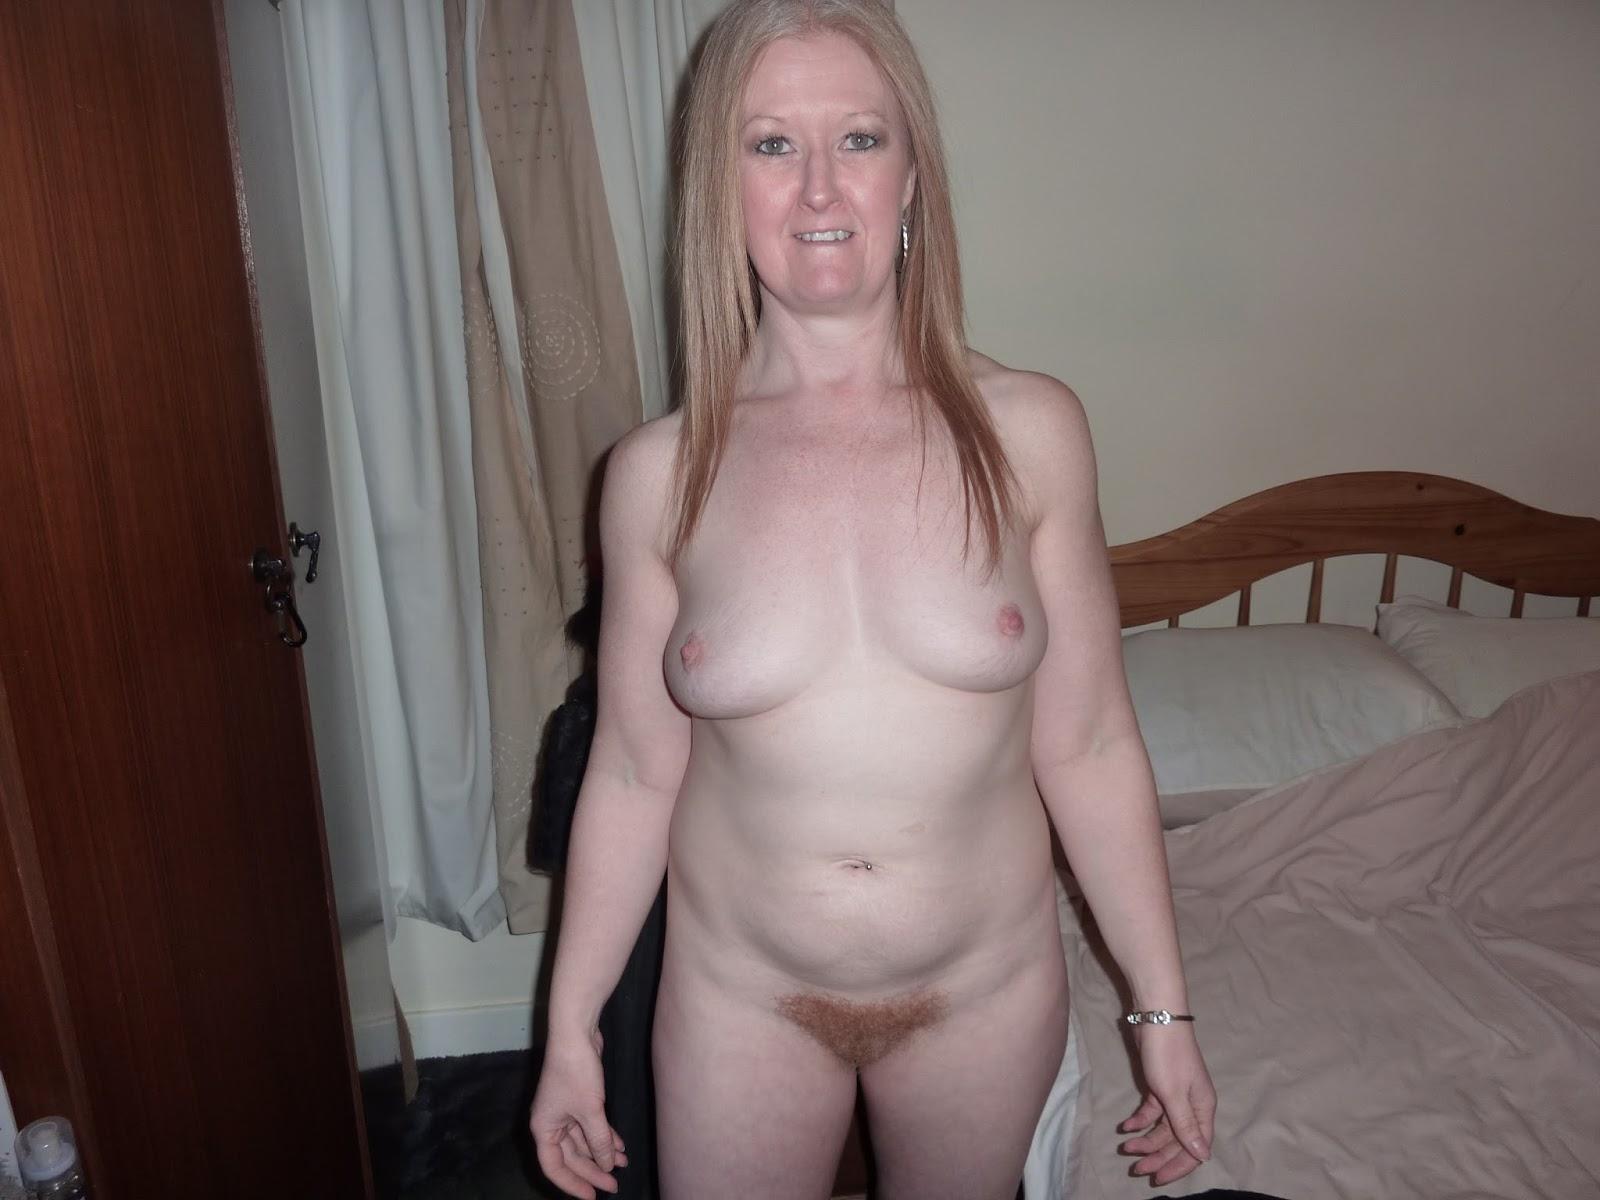 Kyndra mayo bikini